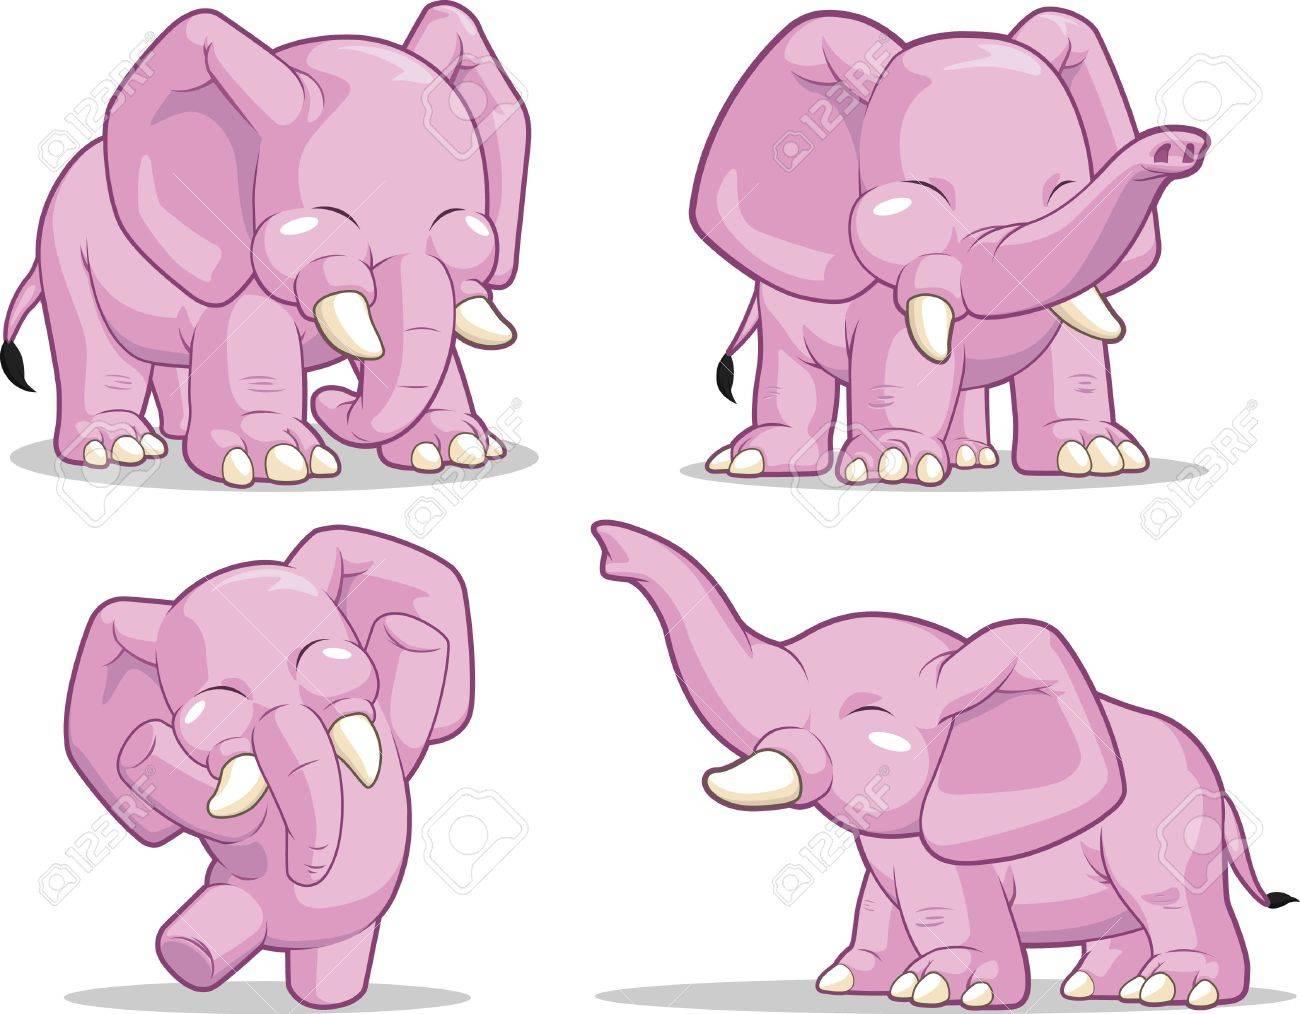 elephant behavior stock photos royalty free elephant behavior